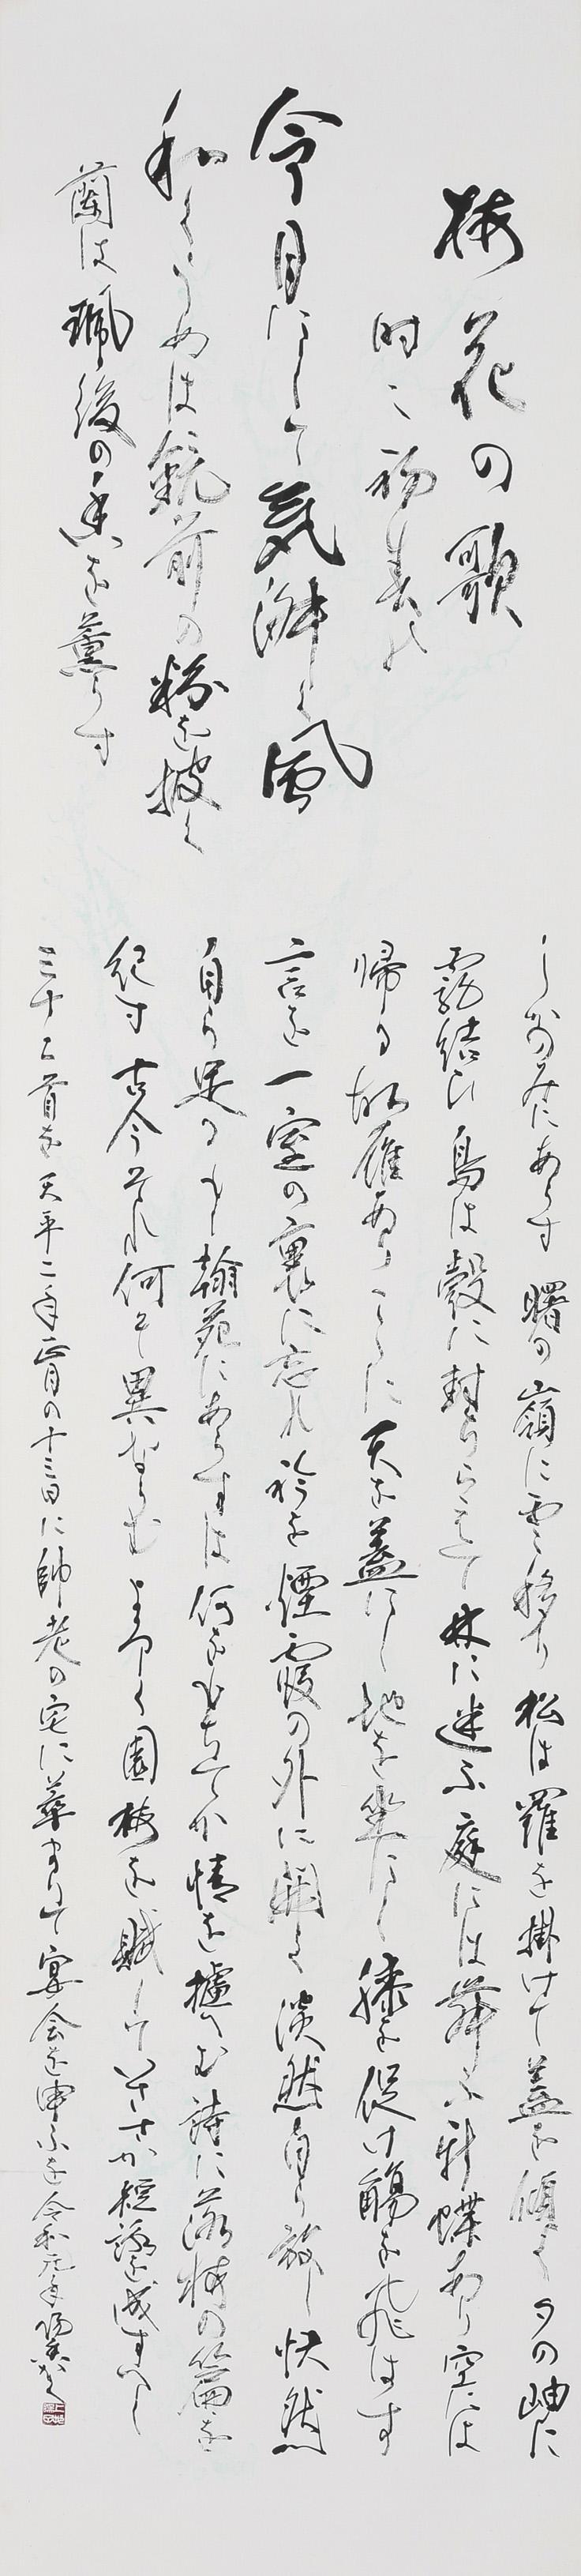 第36回産経国際書展出品作 「梅花の歌」(縦240×横60センチ)